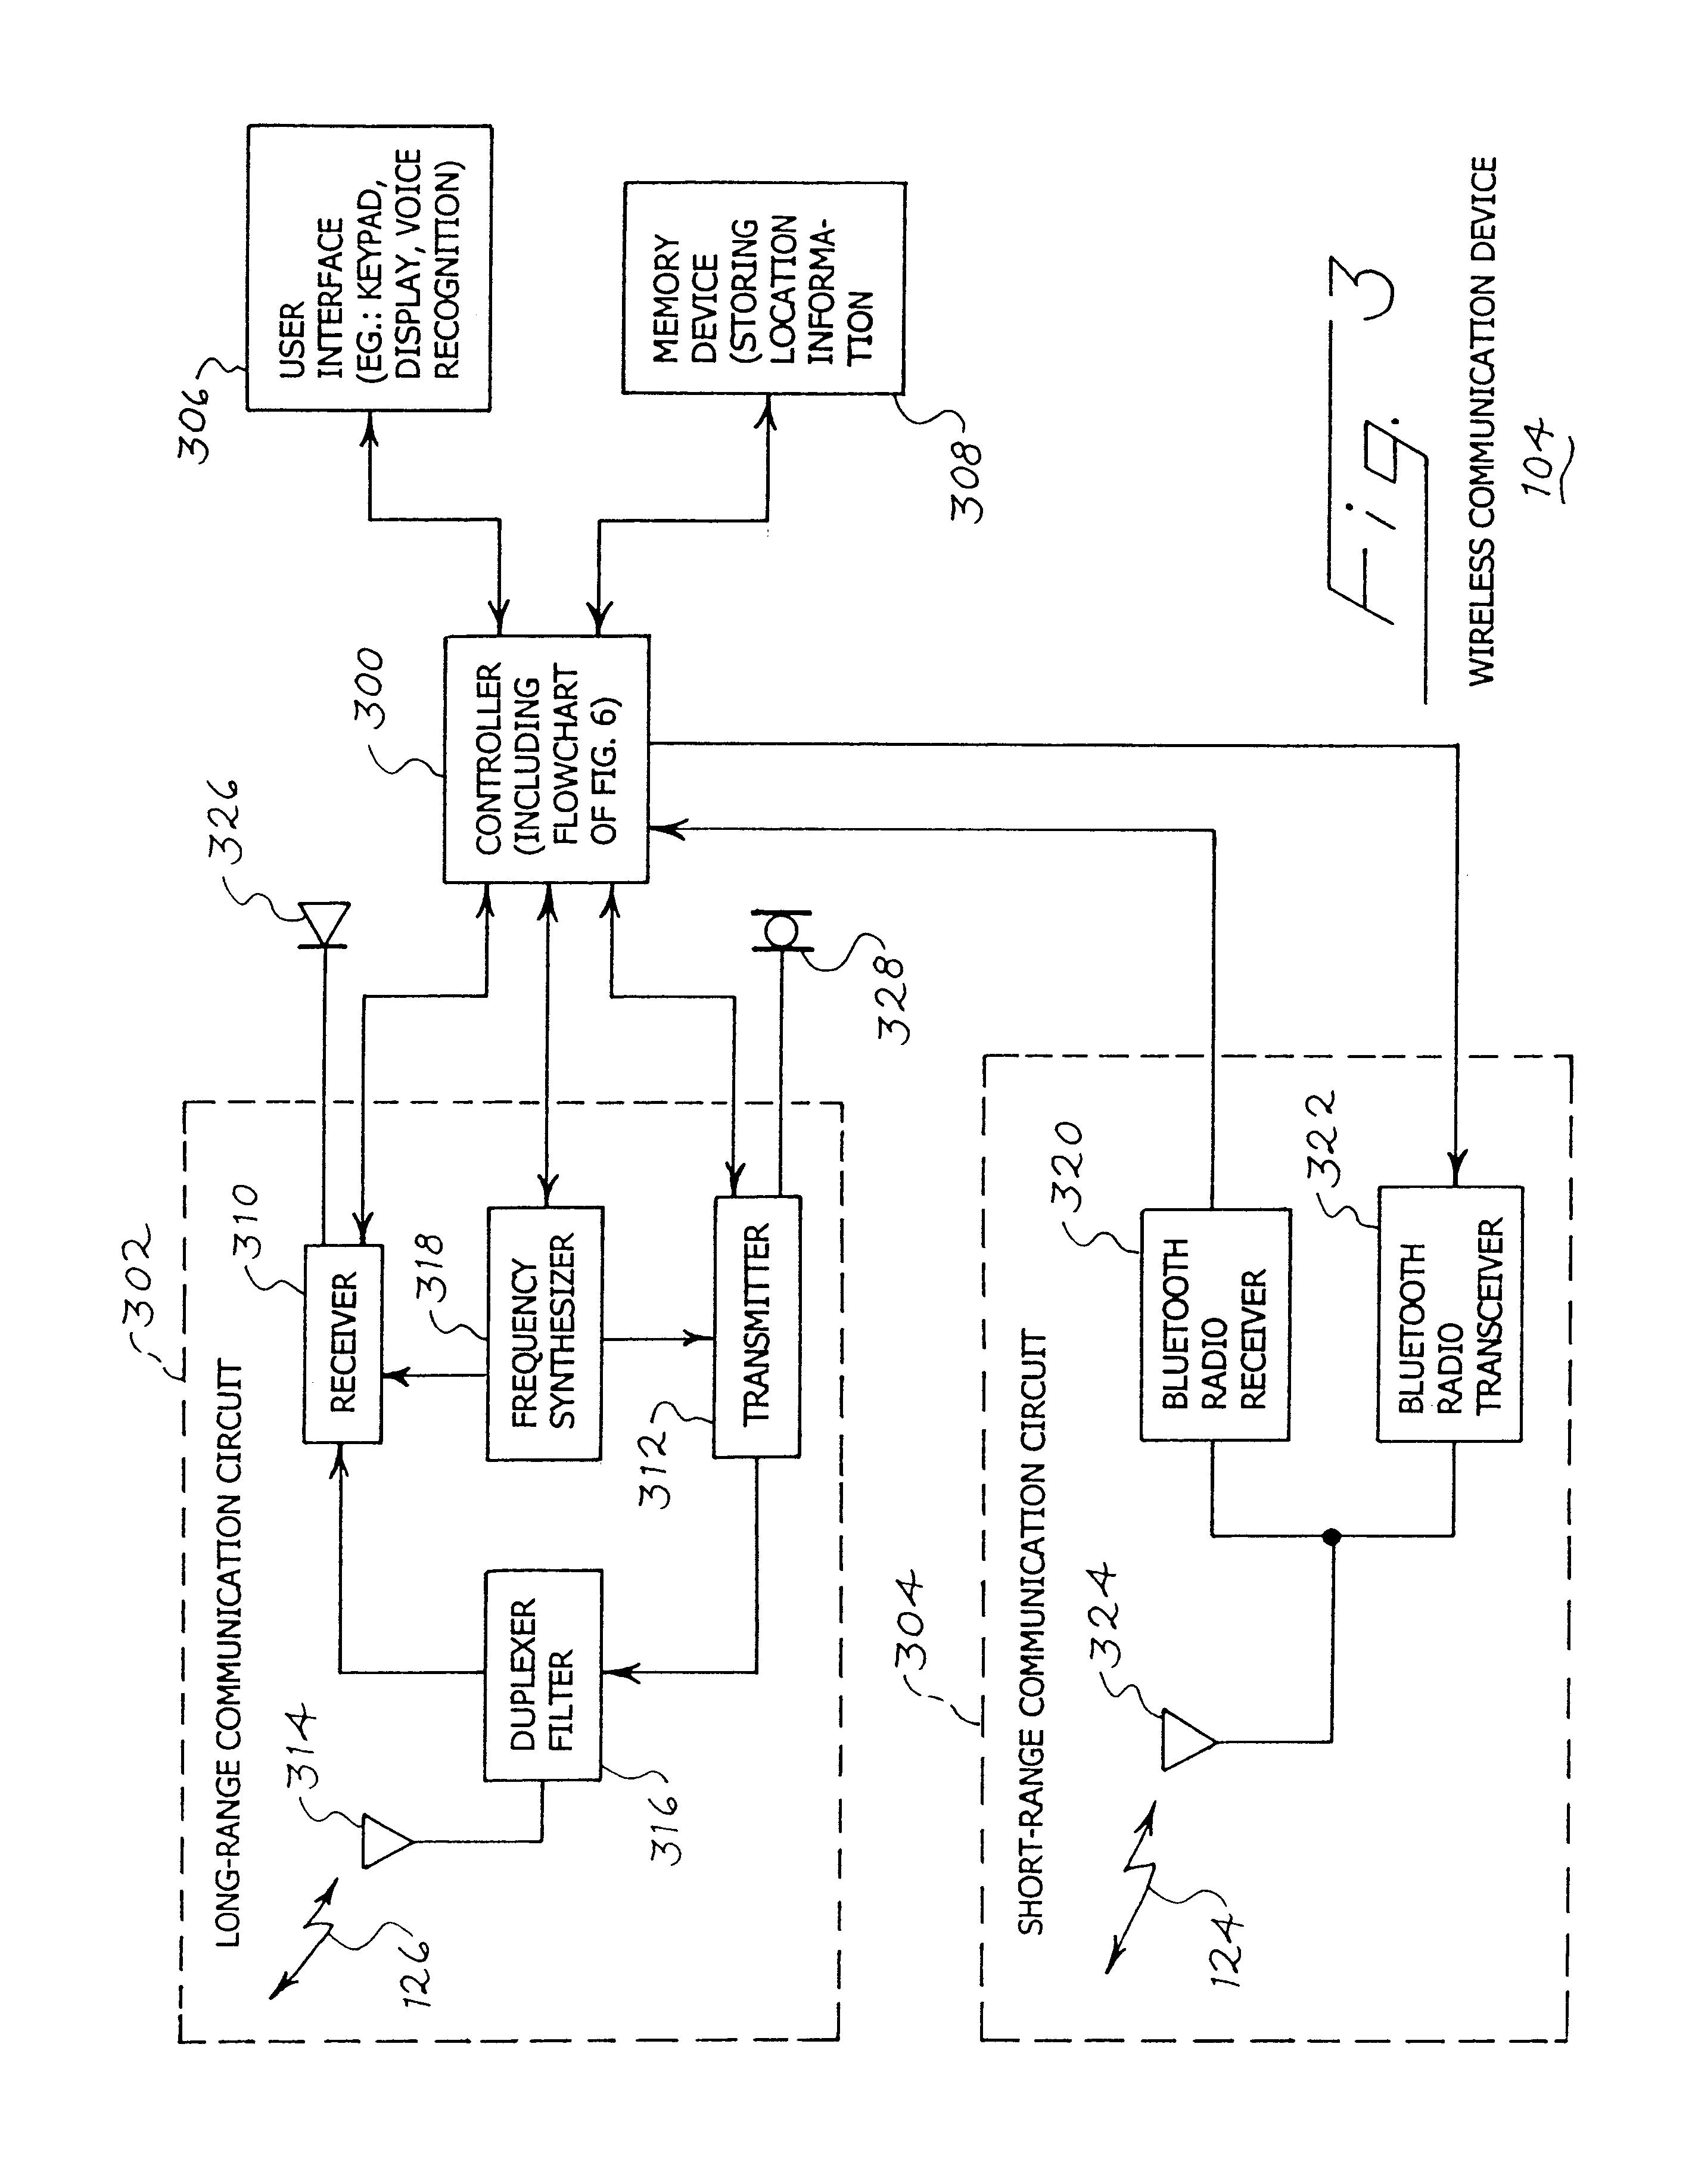 Patent Us 6603977 B1 Integrated Circuit Diagram Communicationcircuit